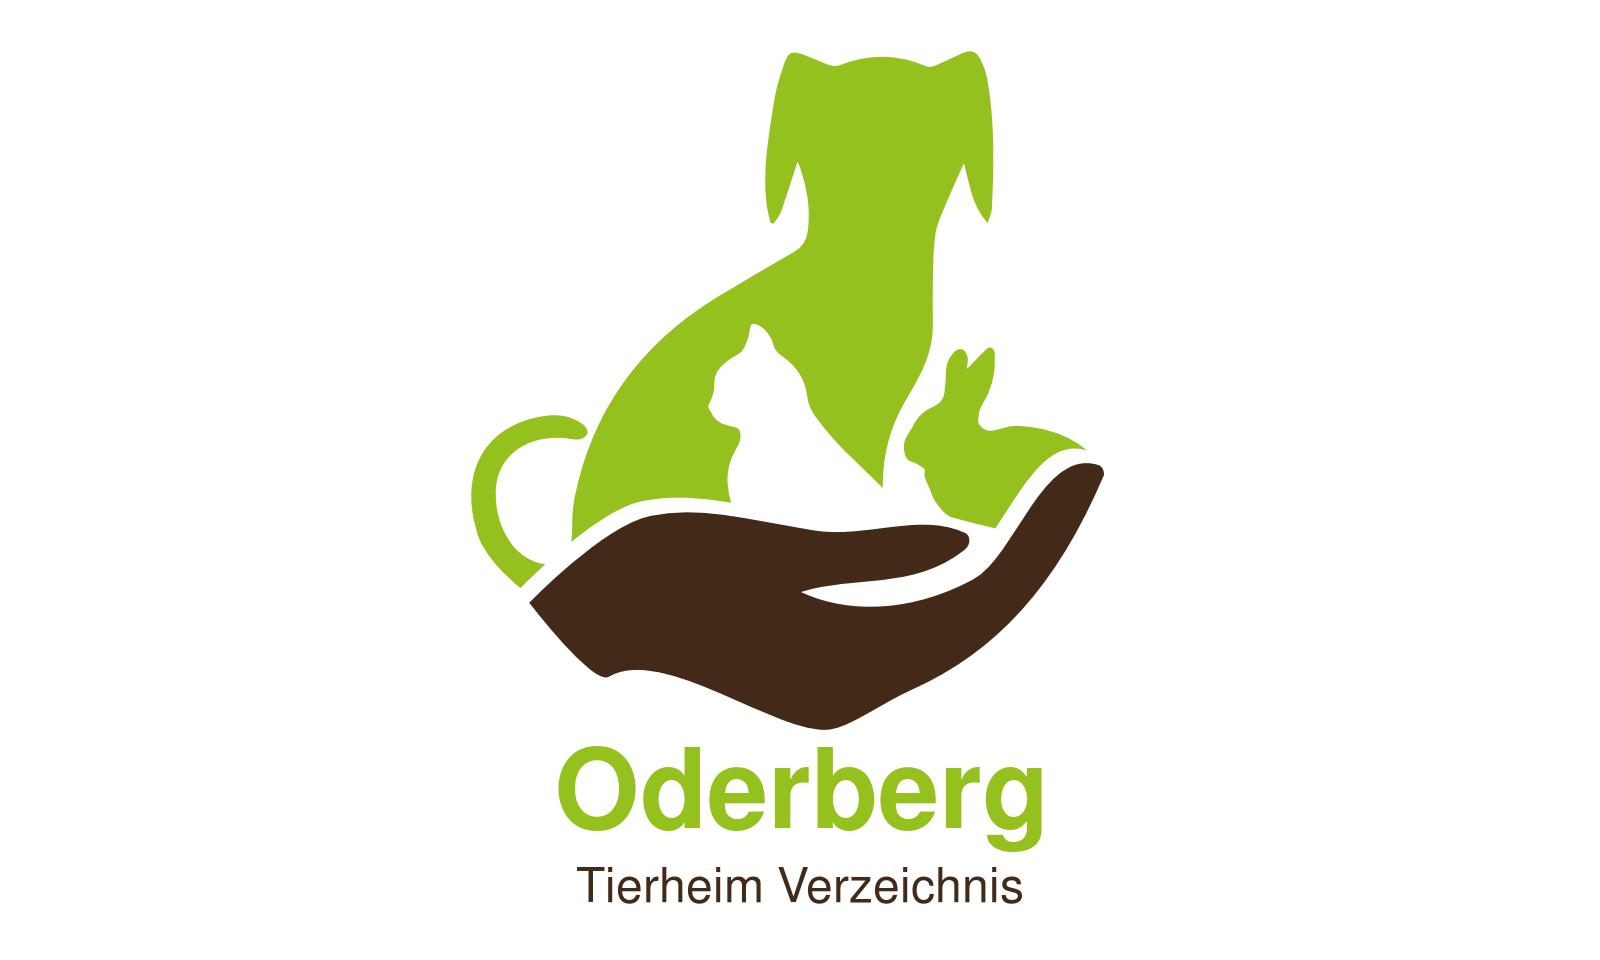 Tierheim Oderberg